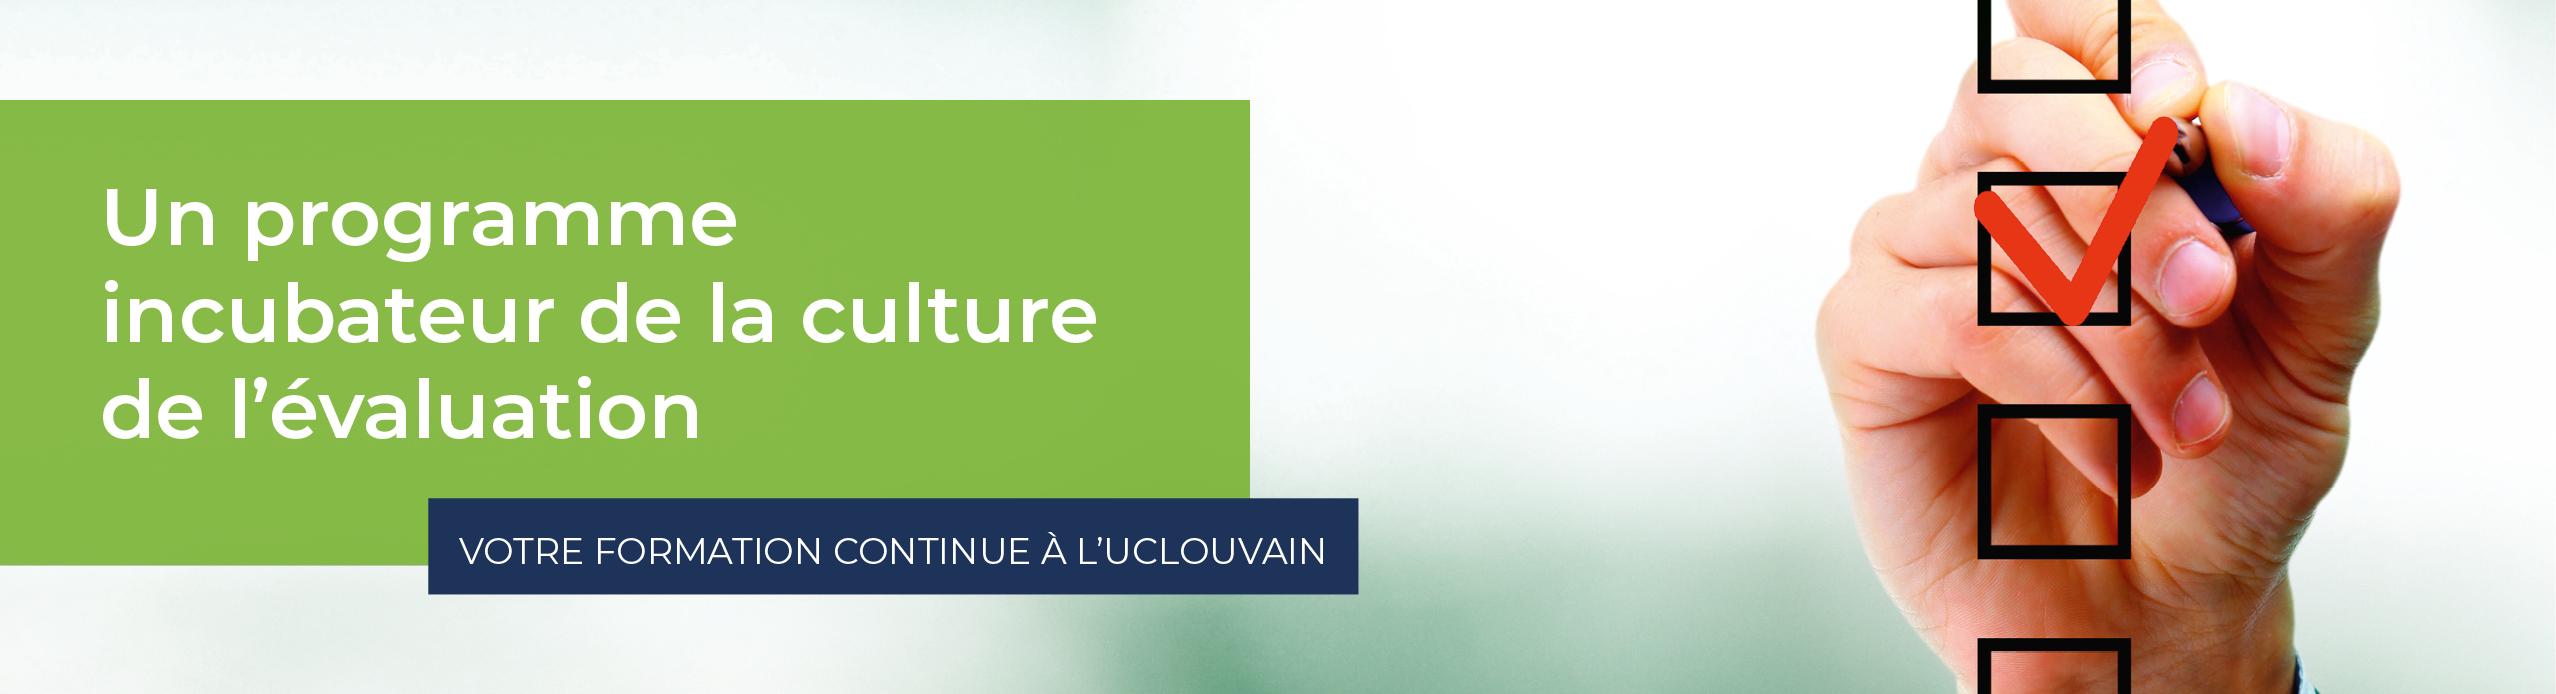 EvaluationPolitiquesPubliques_Header_Homepage.jpg